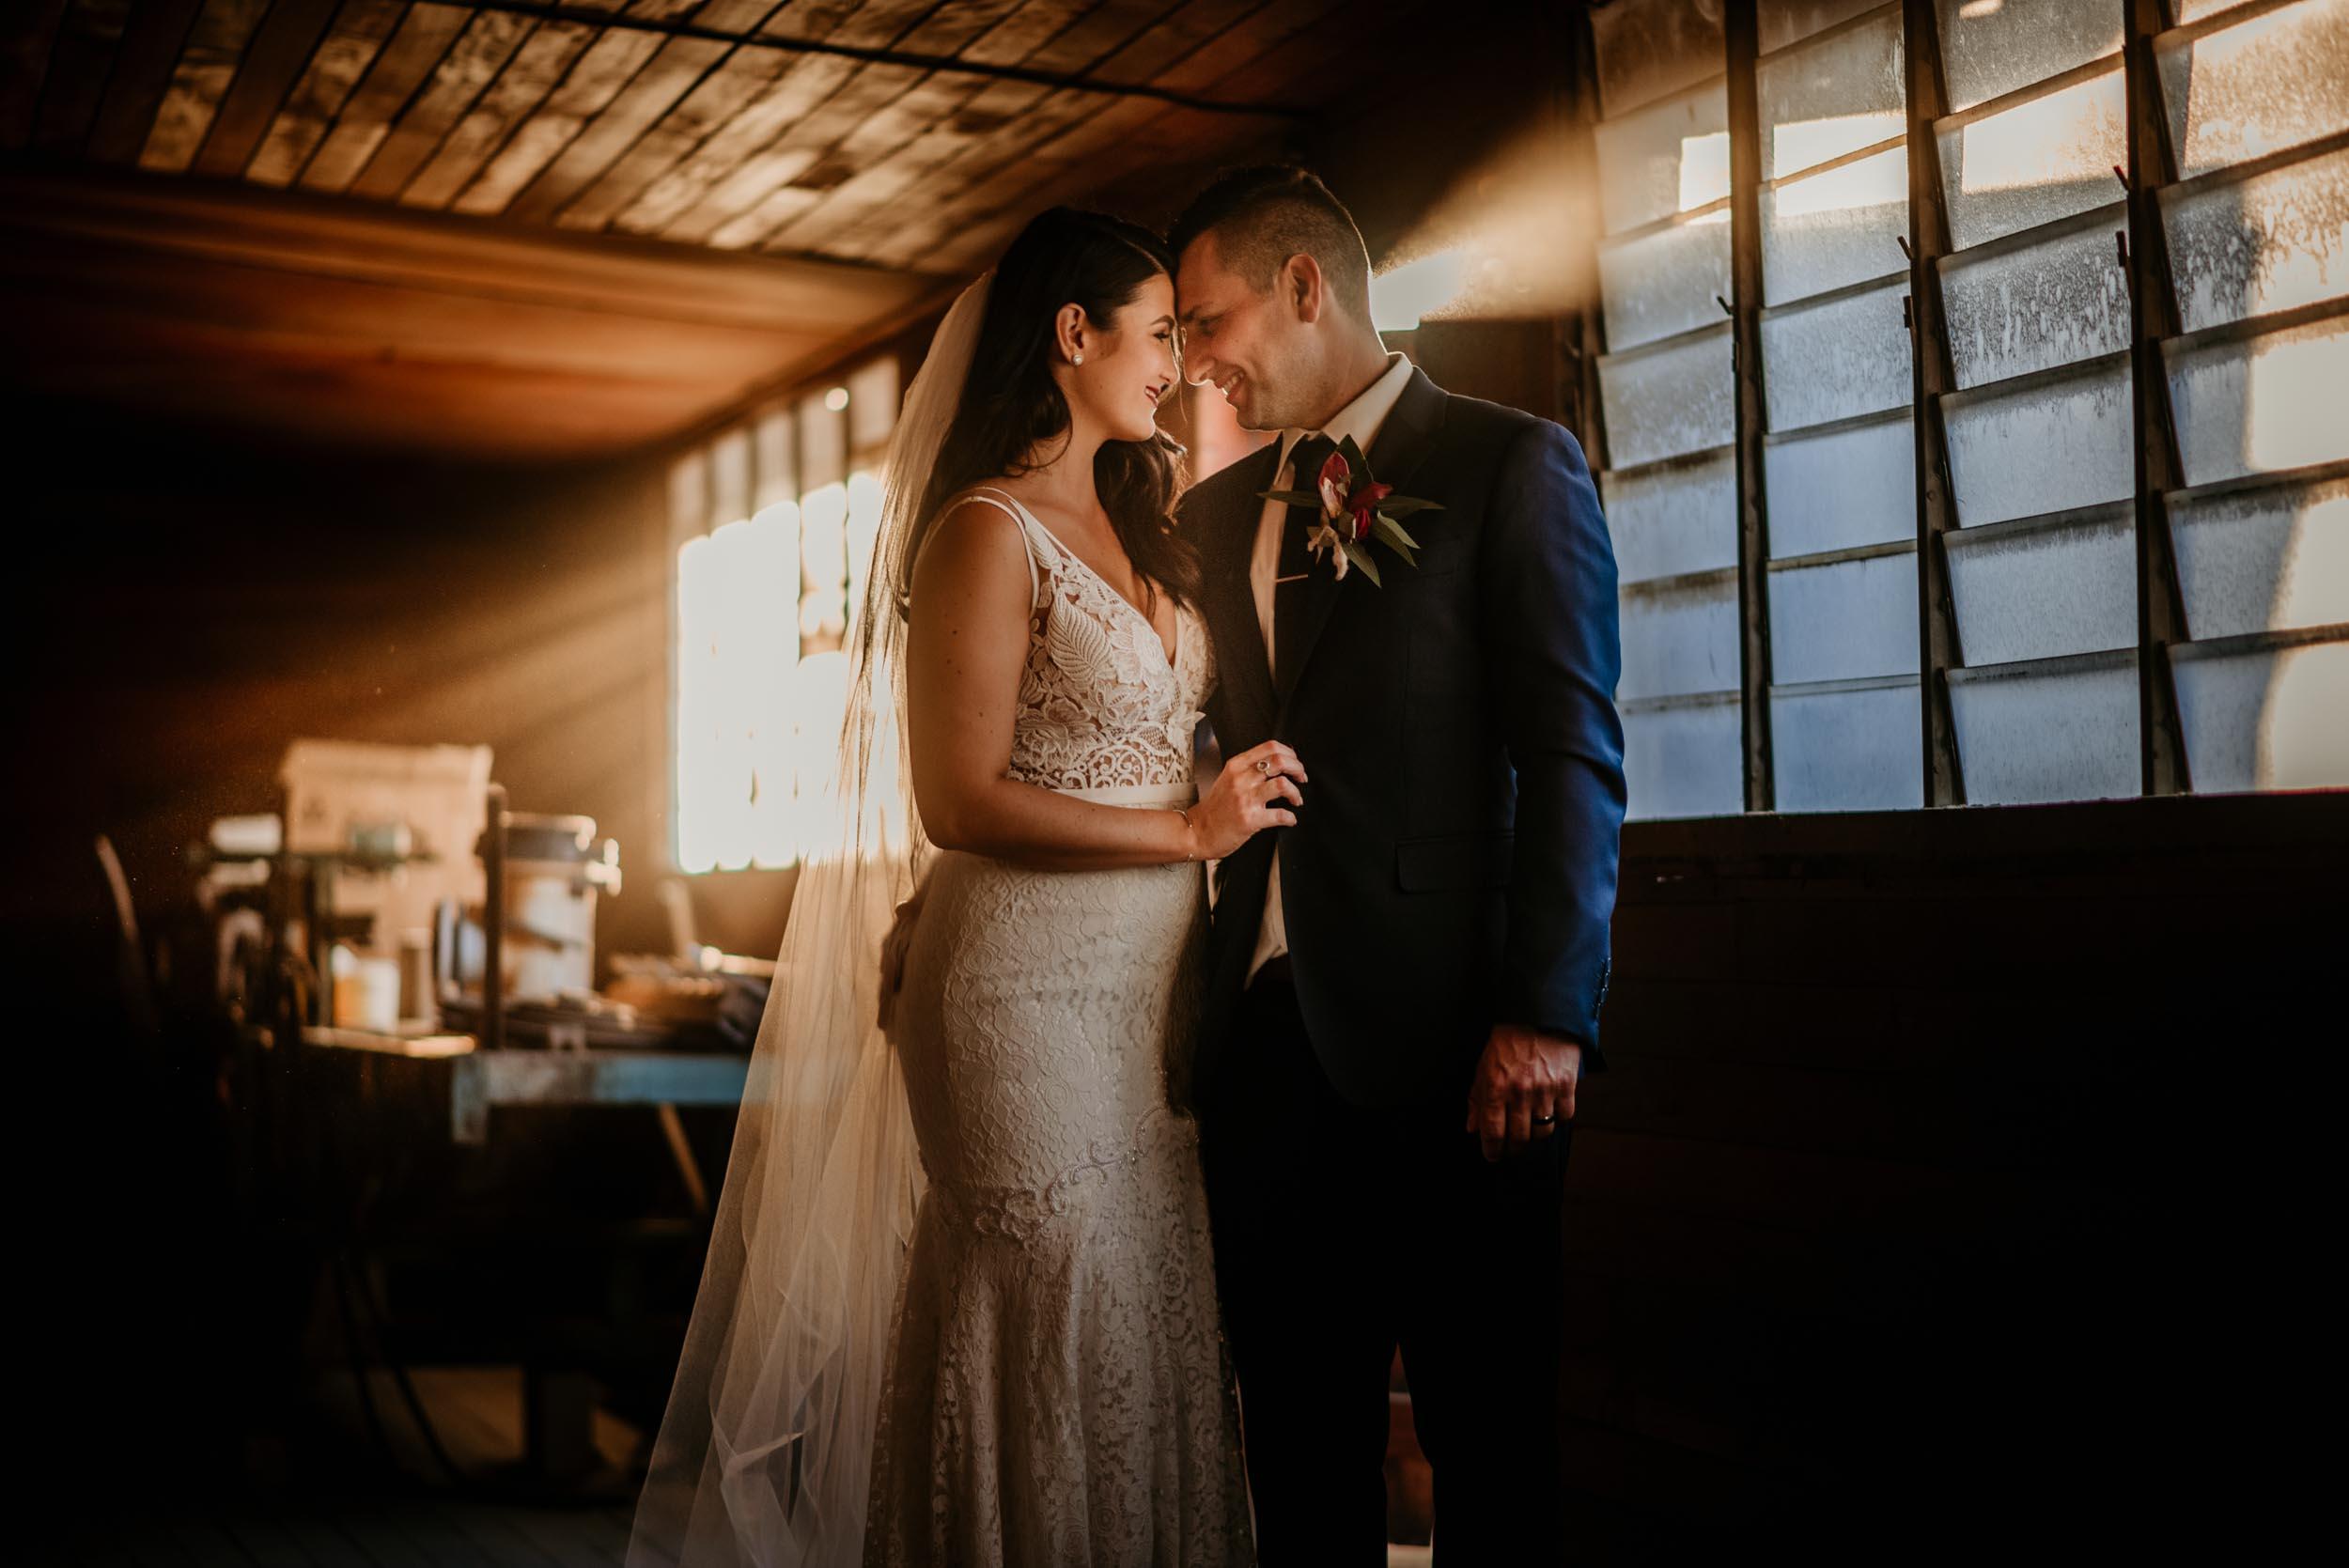 The Raw Photographer - Cairns Wedding Photographer - Atherton Tablelands - Mareeba farm Wedding - Irene Costa's Devine Bridal - Candid - Photo Package-44.jpg